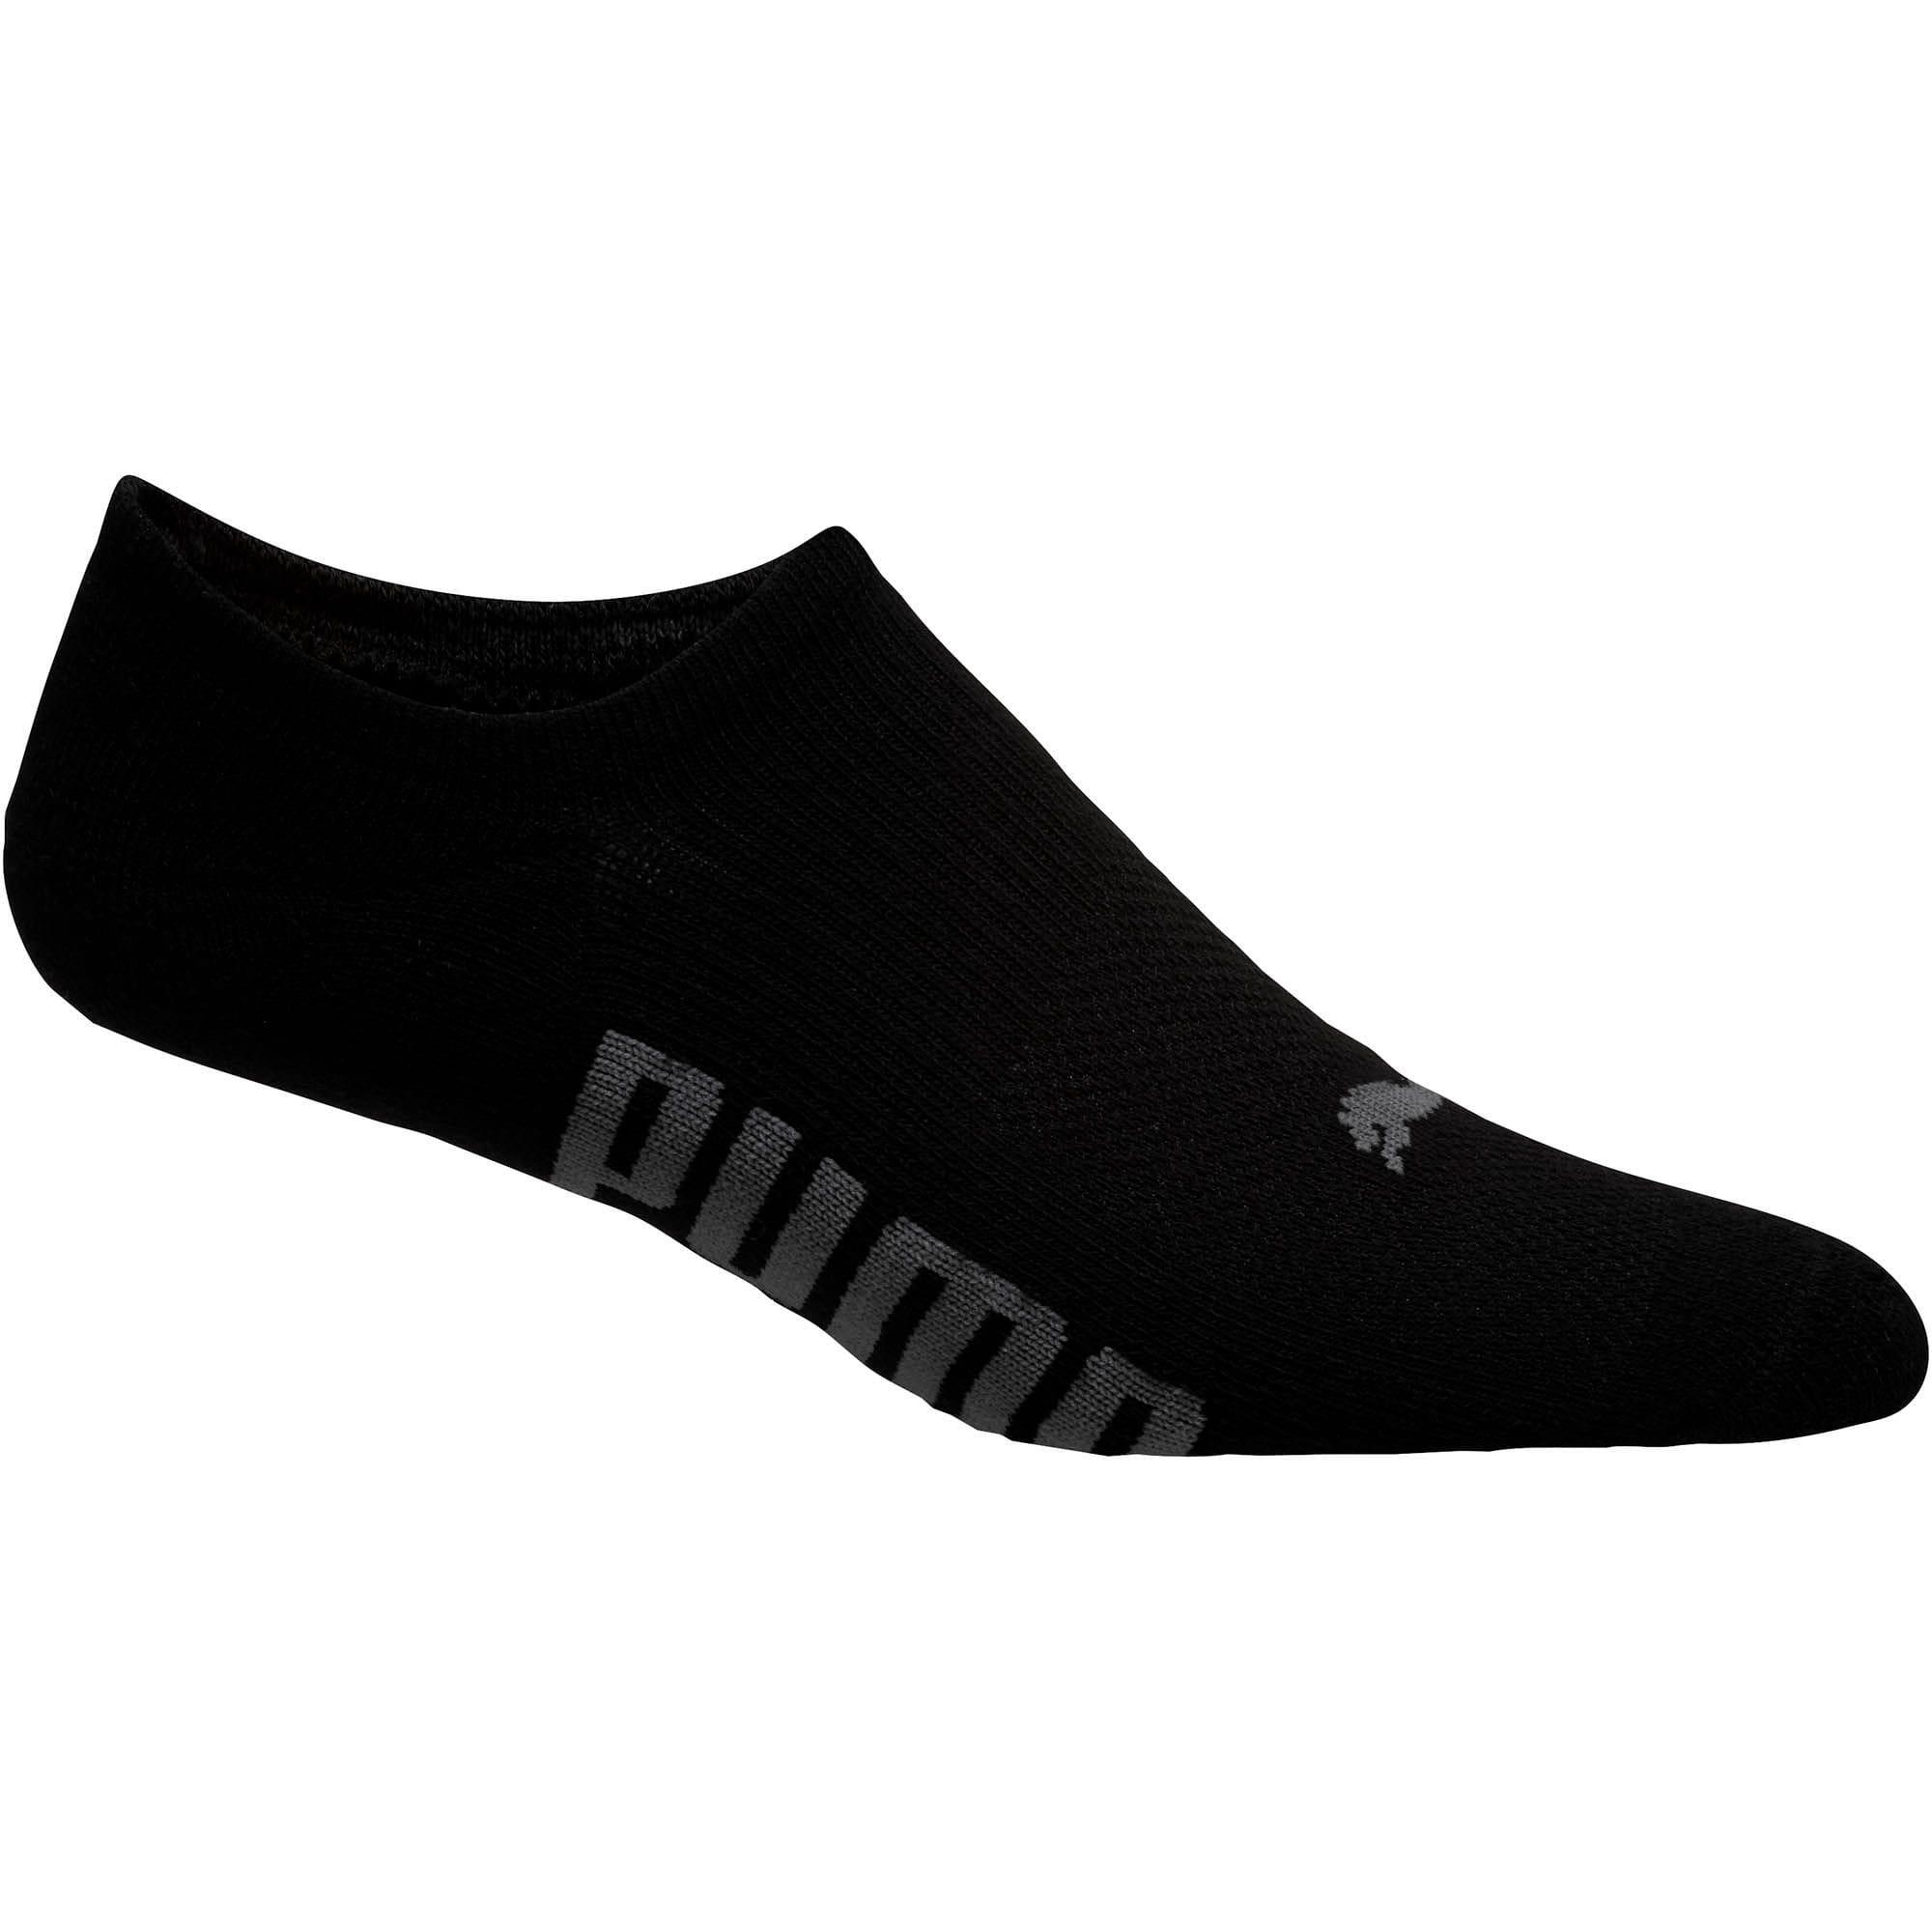 Thumbnail 3 of Men's Invisible No Show Socks [3 Pack], black, medium